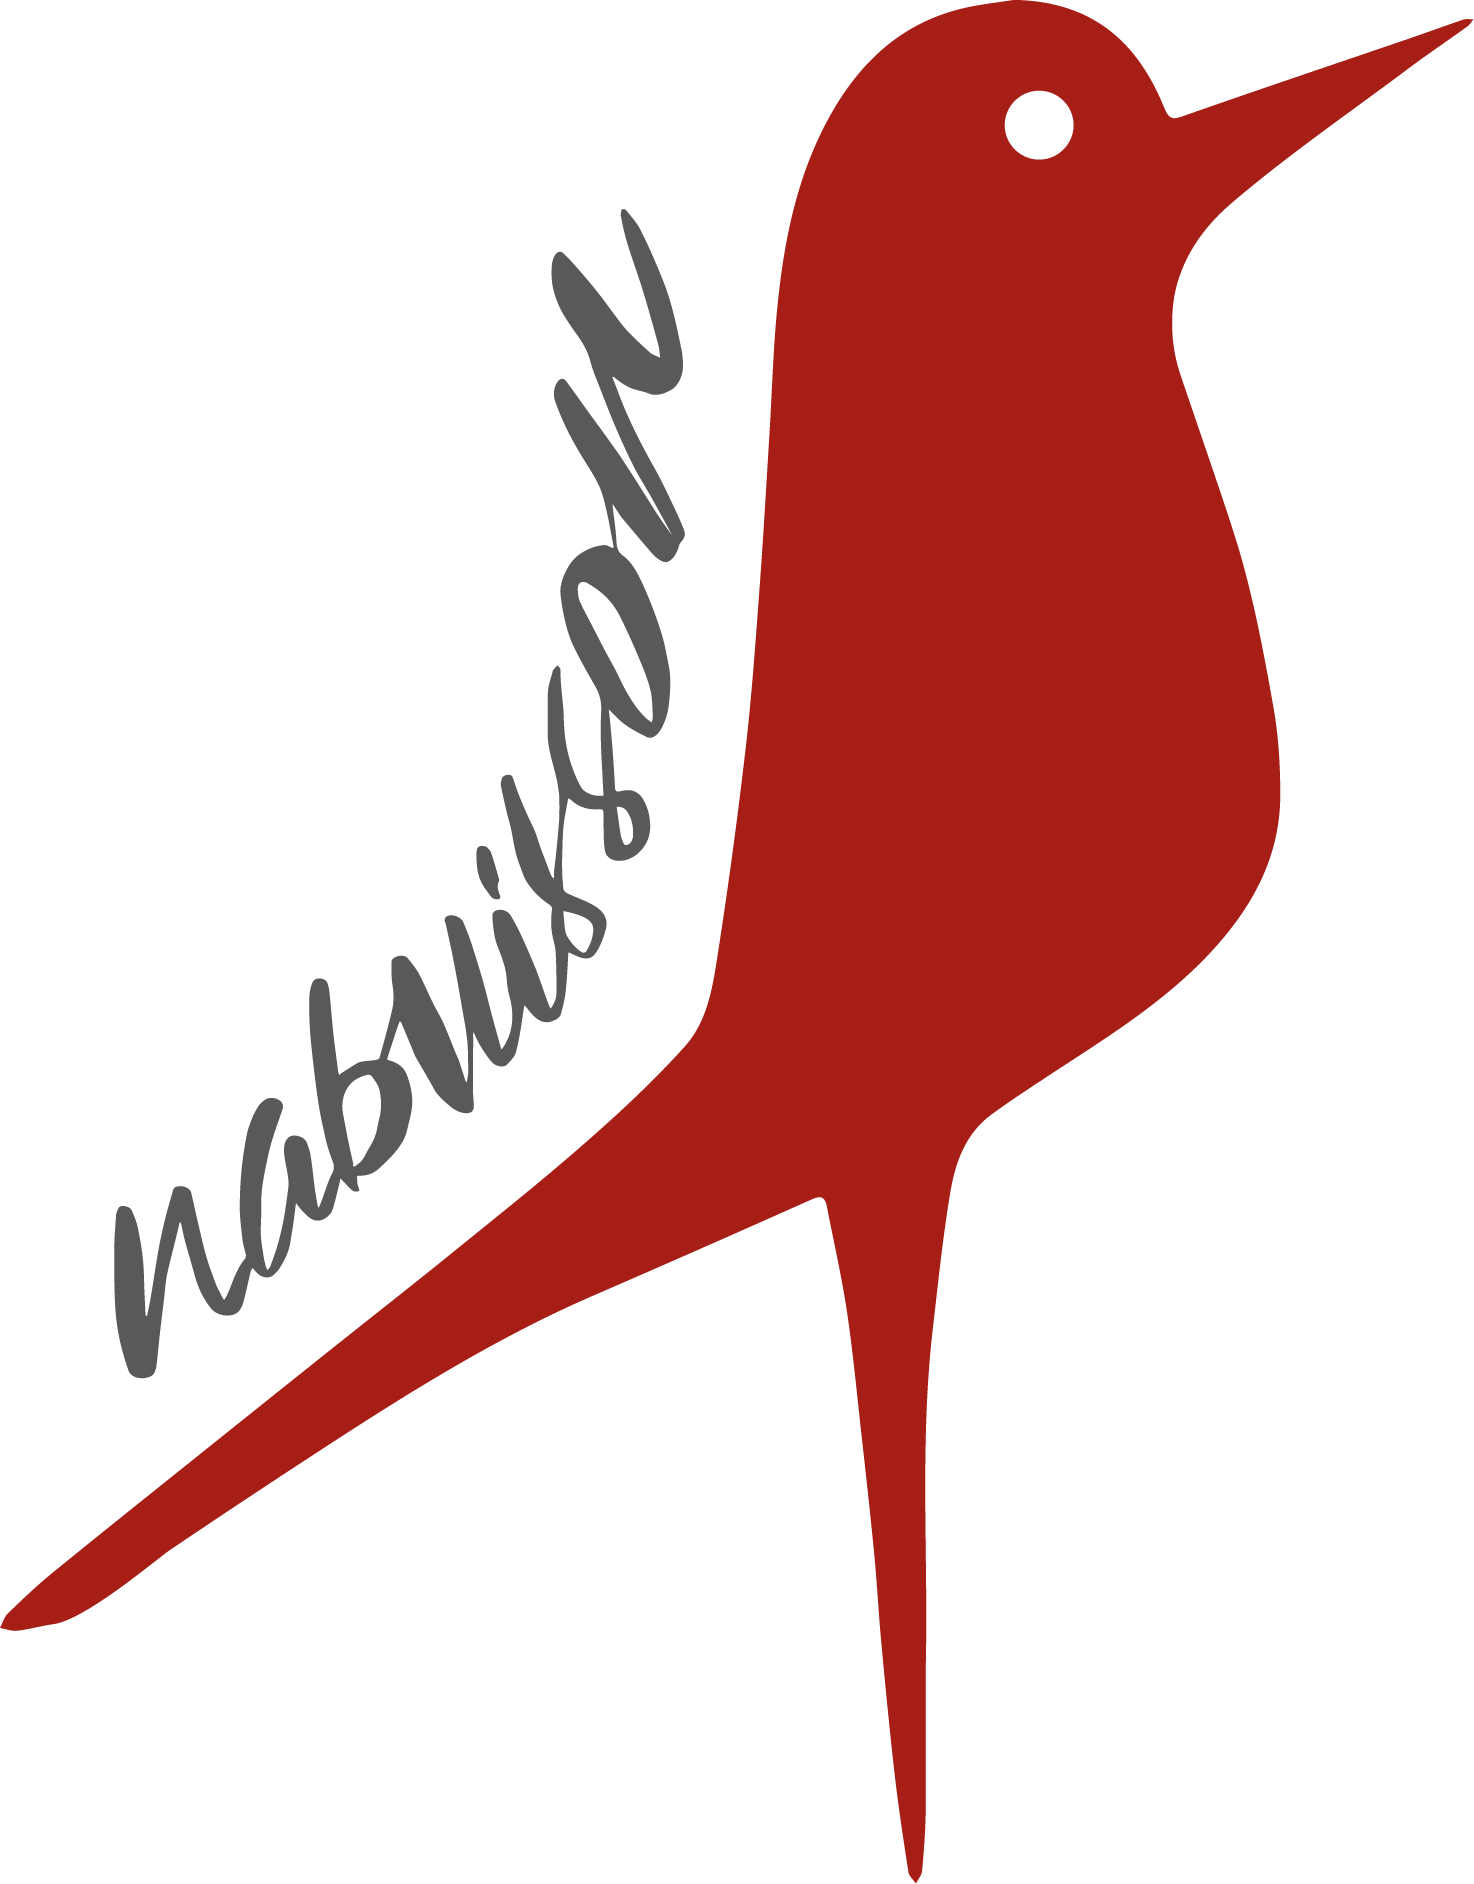 Nabuisson - B&B Aosta